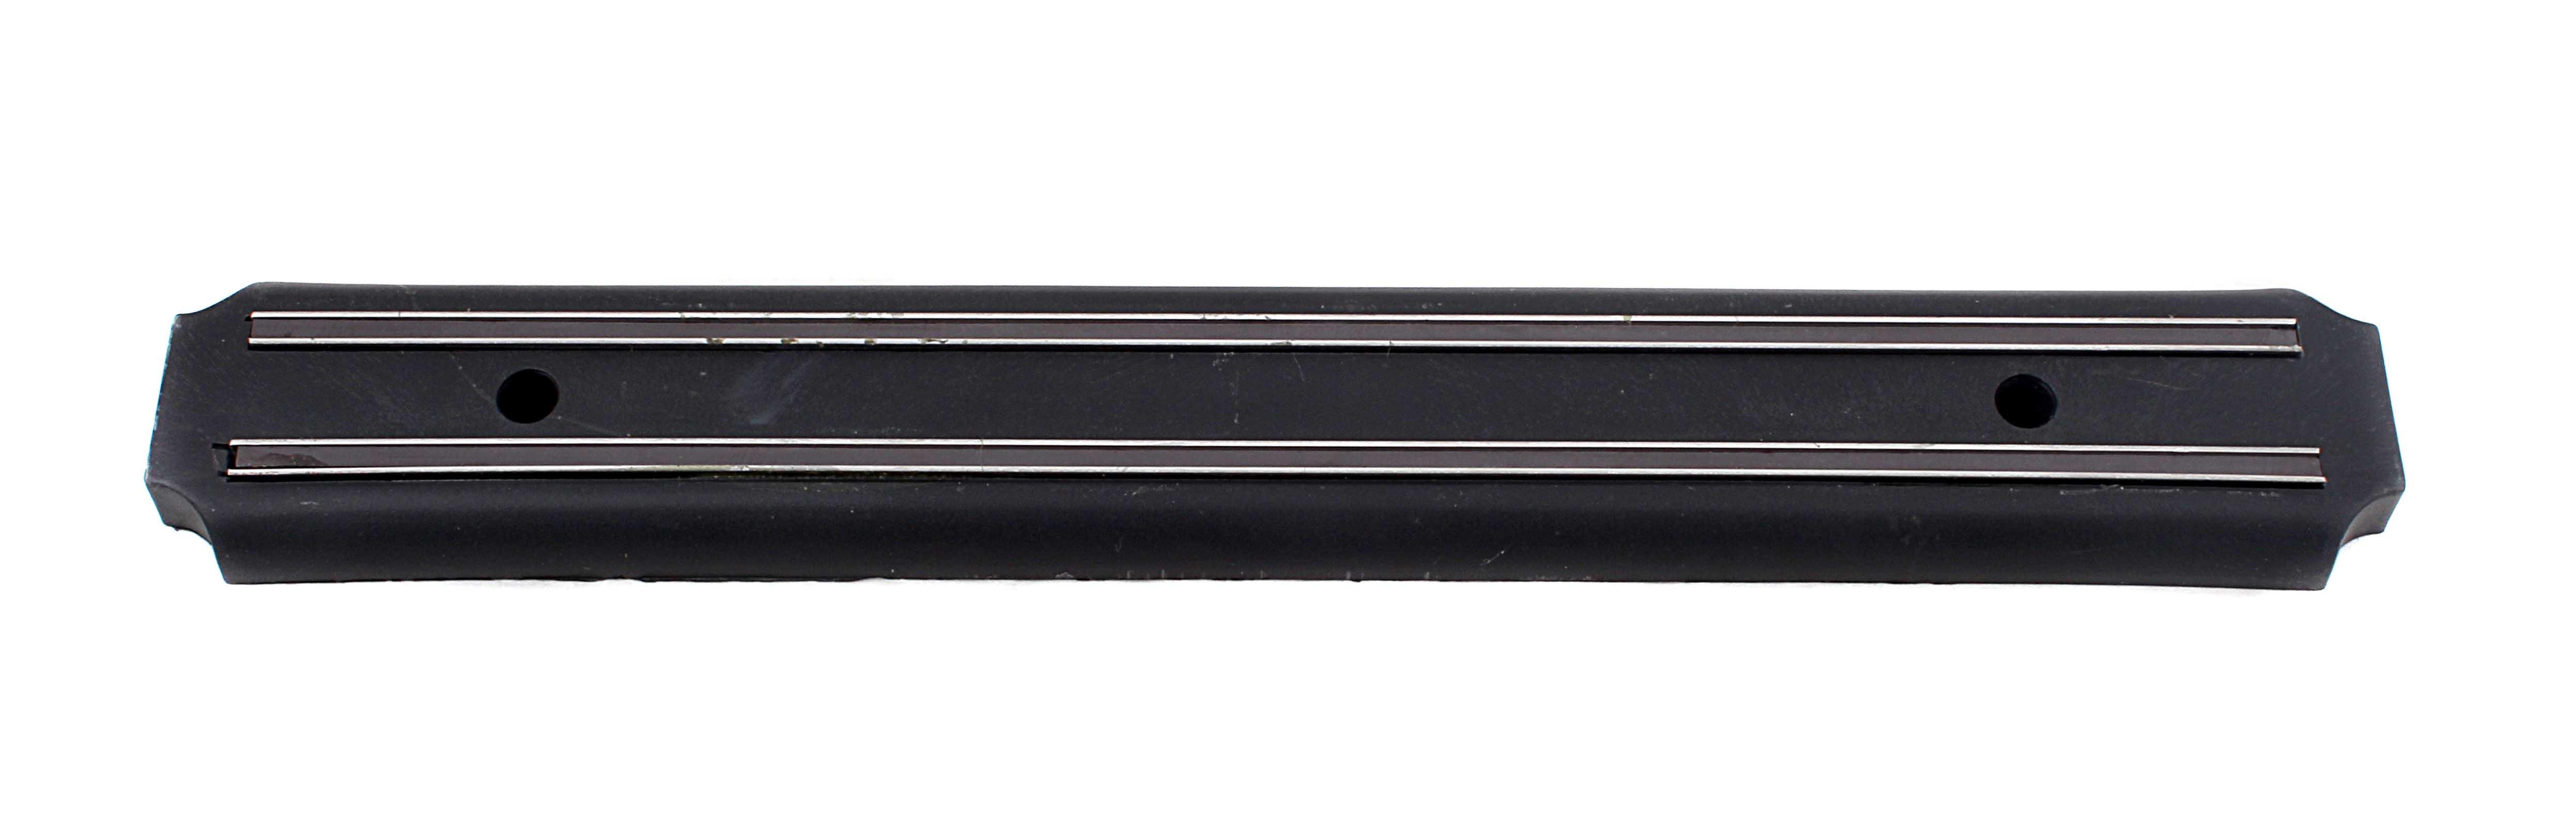 Ножи Vetta Real Brand Technics 142.000